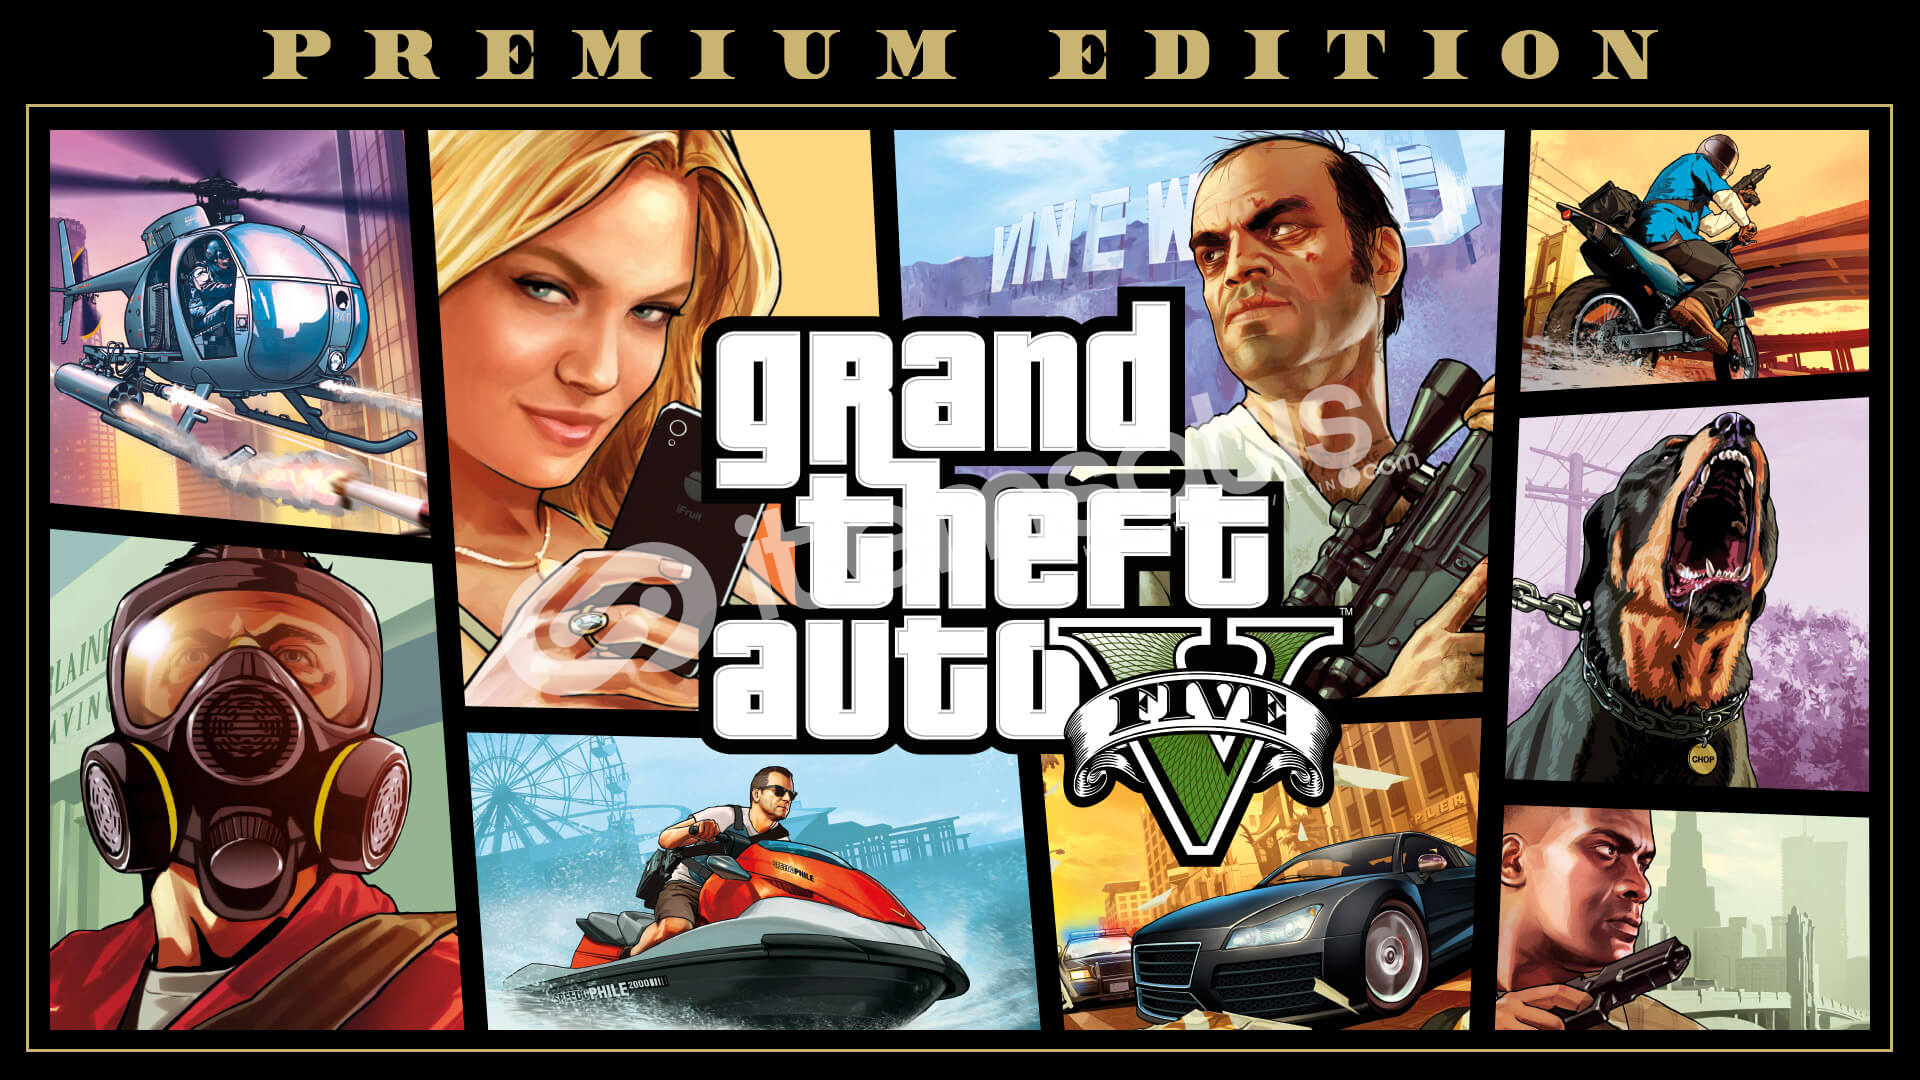 Grand Theft Auto V +22 Oyun Hediye !!!